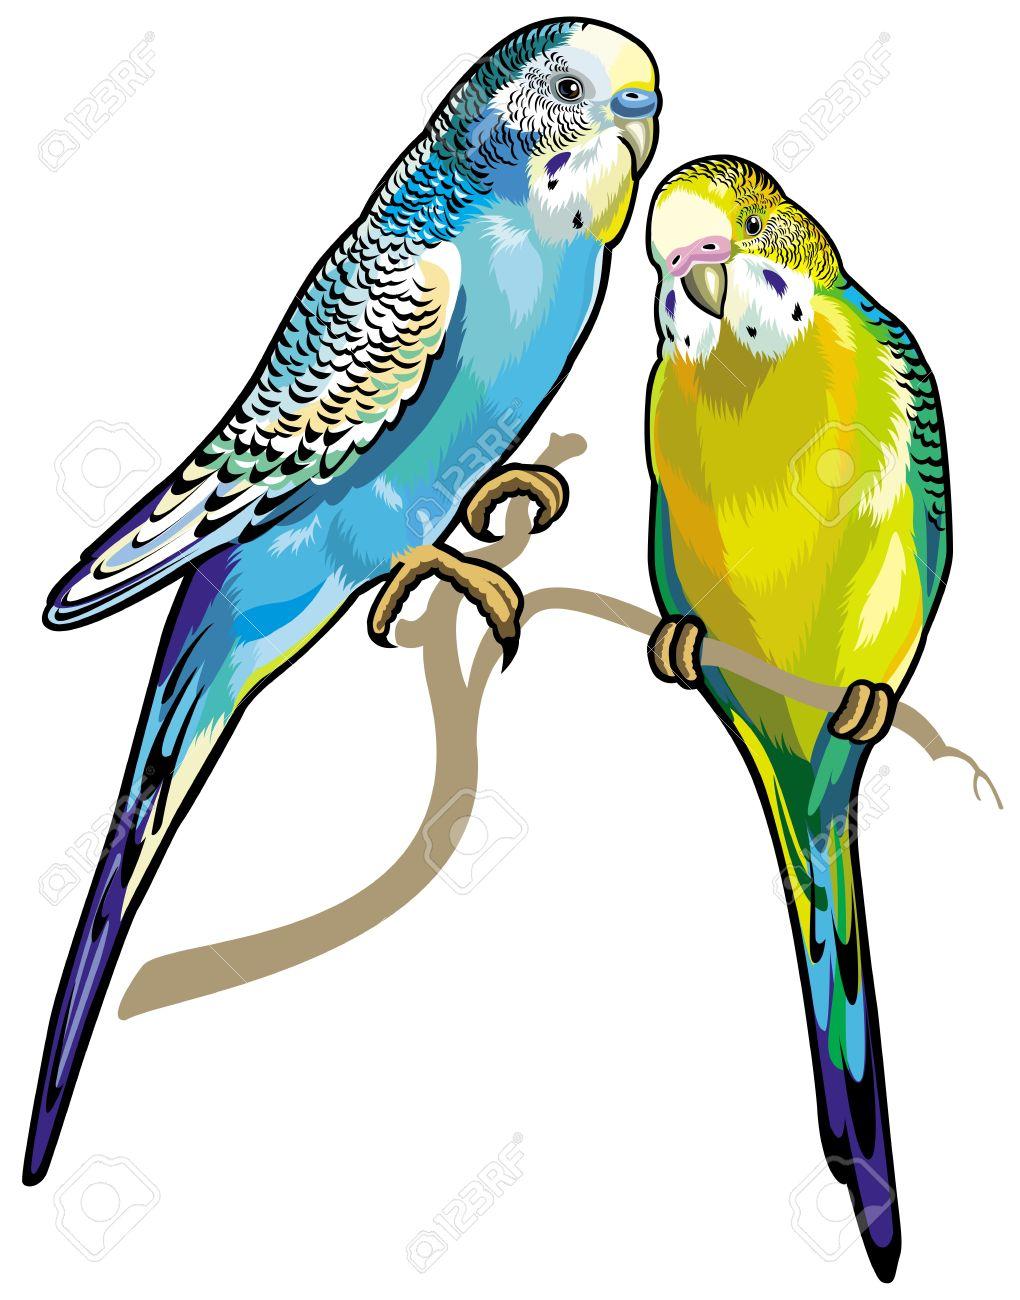 Parakeet clipart #18, Download drawings